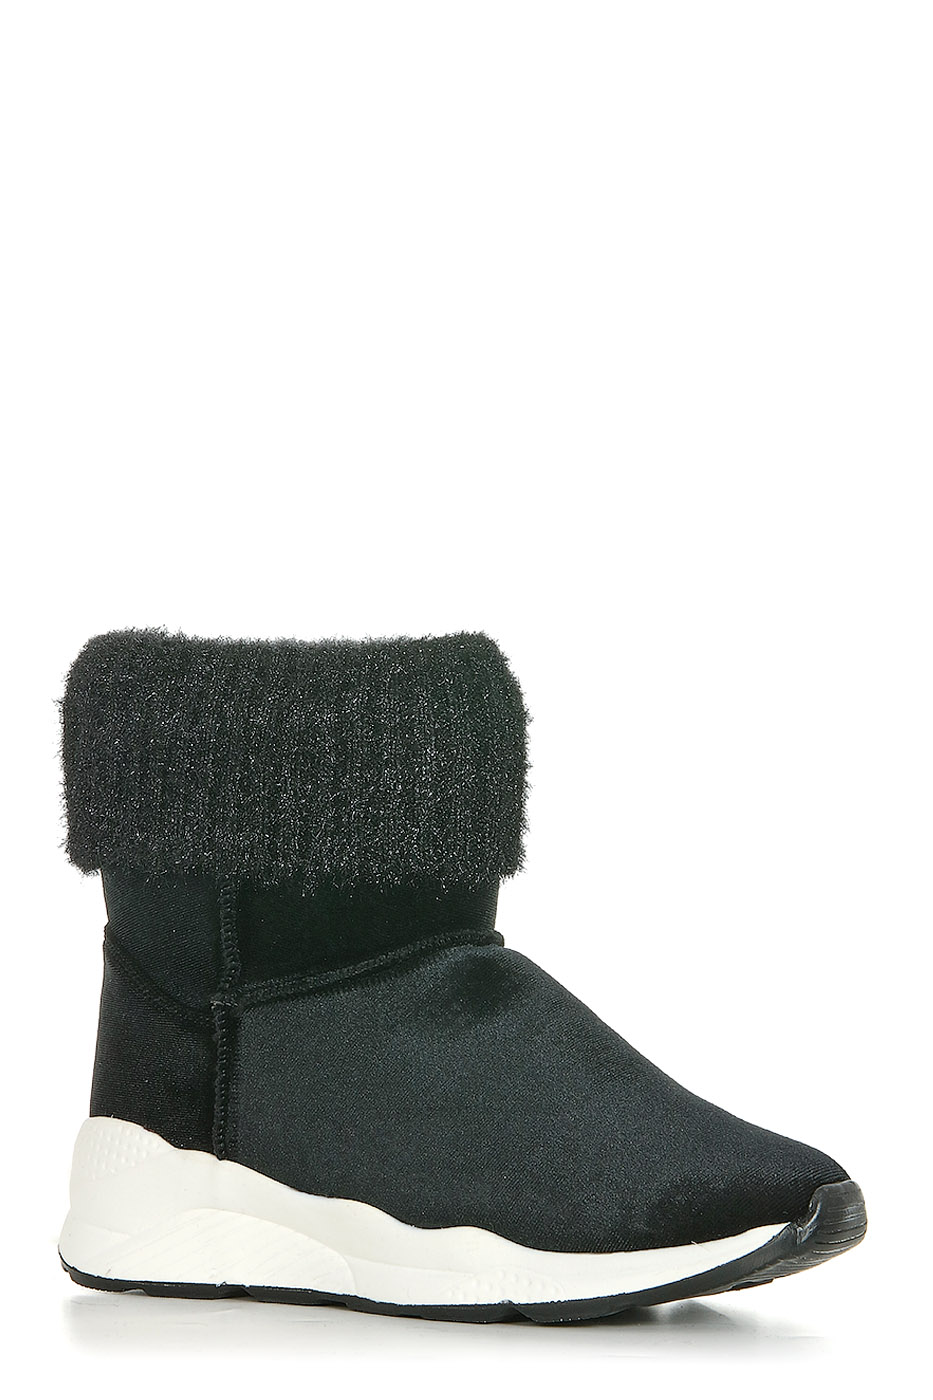 Ботинки TOPLAND2352-PB76169B/BLACK